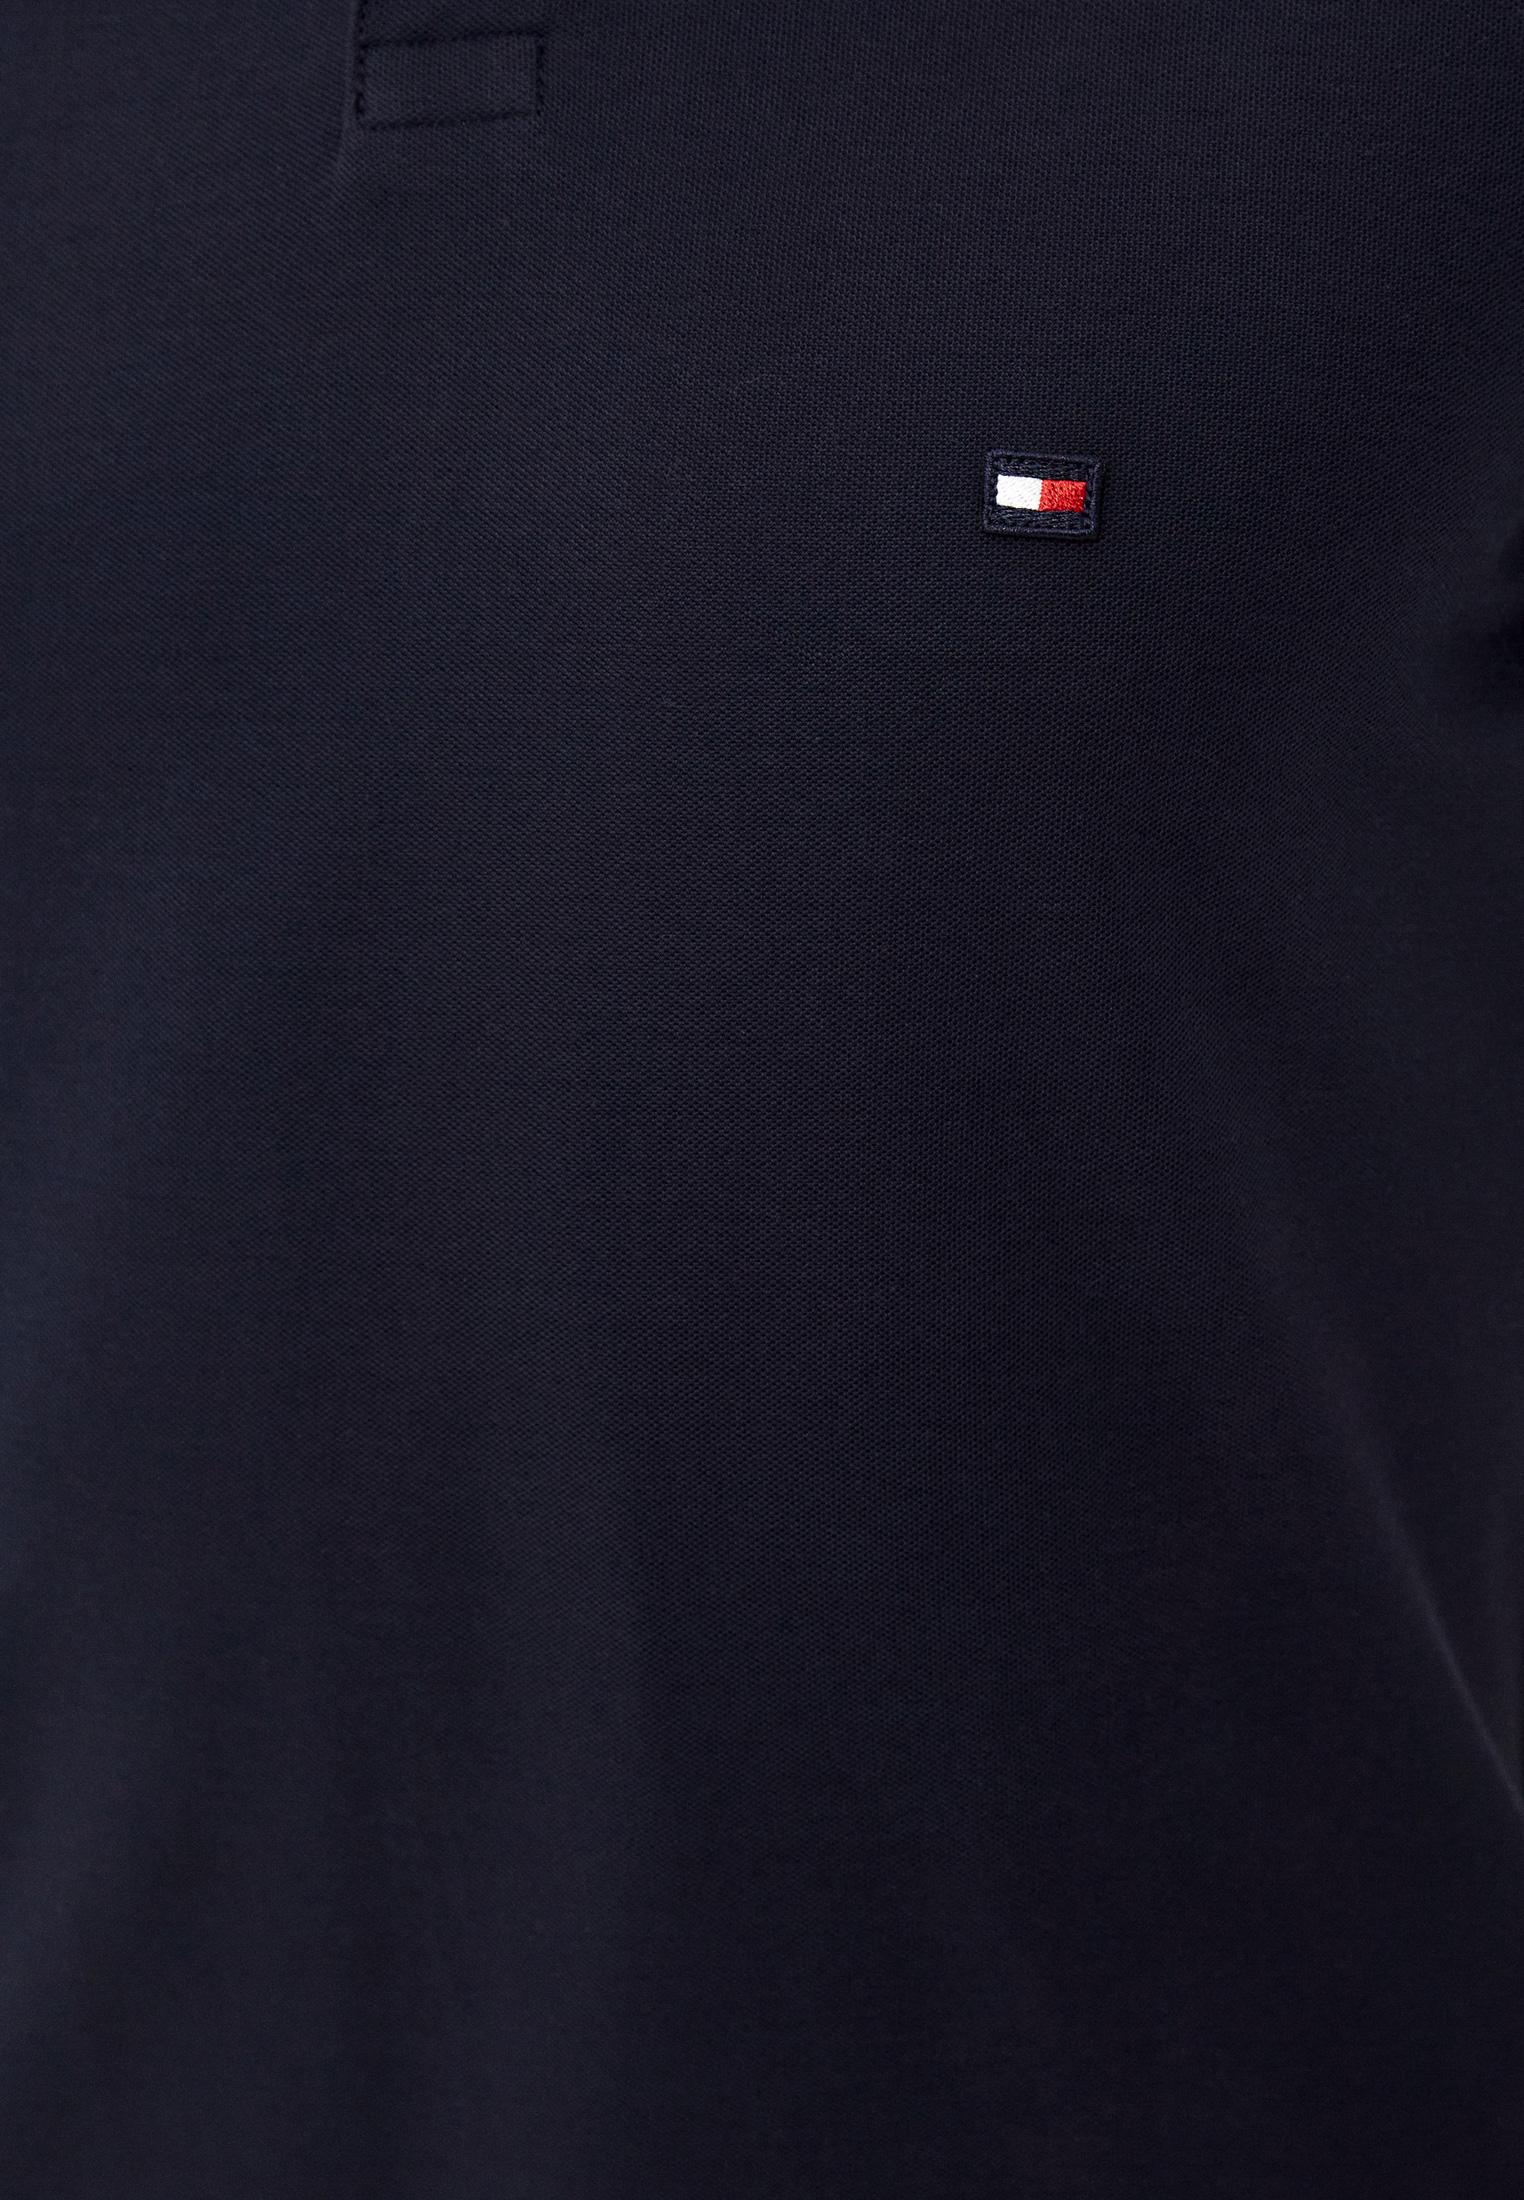 Мужские поло Tommy Hilfiger (Томми Хилфигер) MW0MW17774: изображение 3